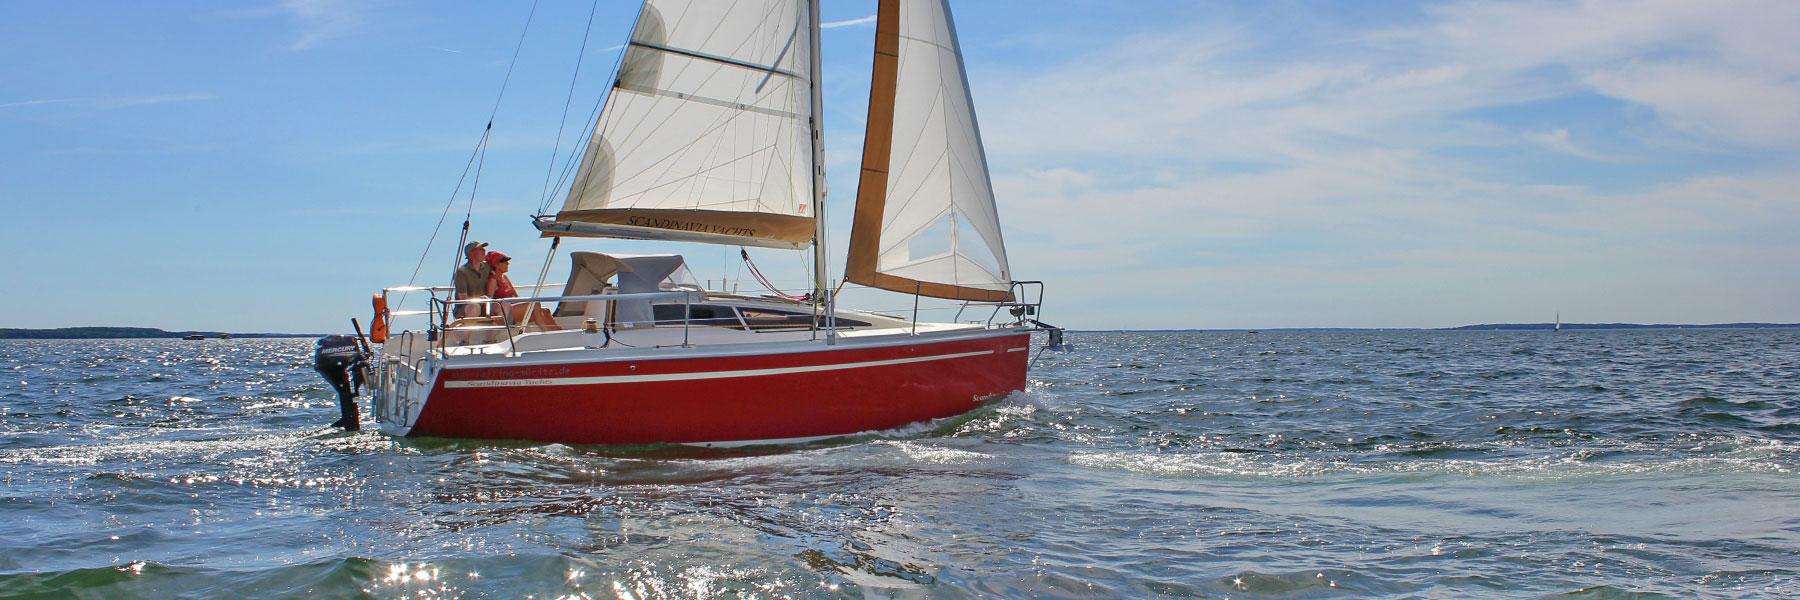 Segeltörn - Sun Sailing Müritz